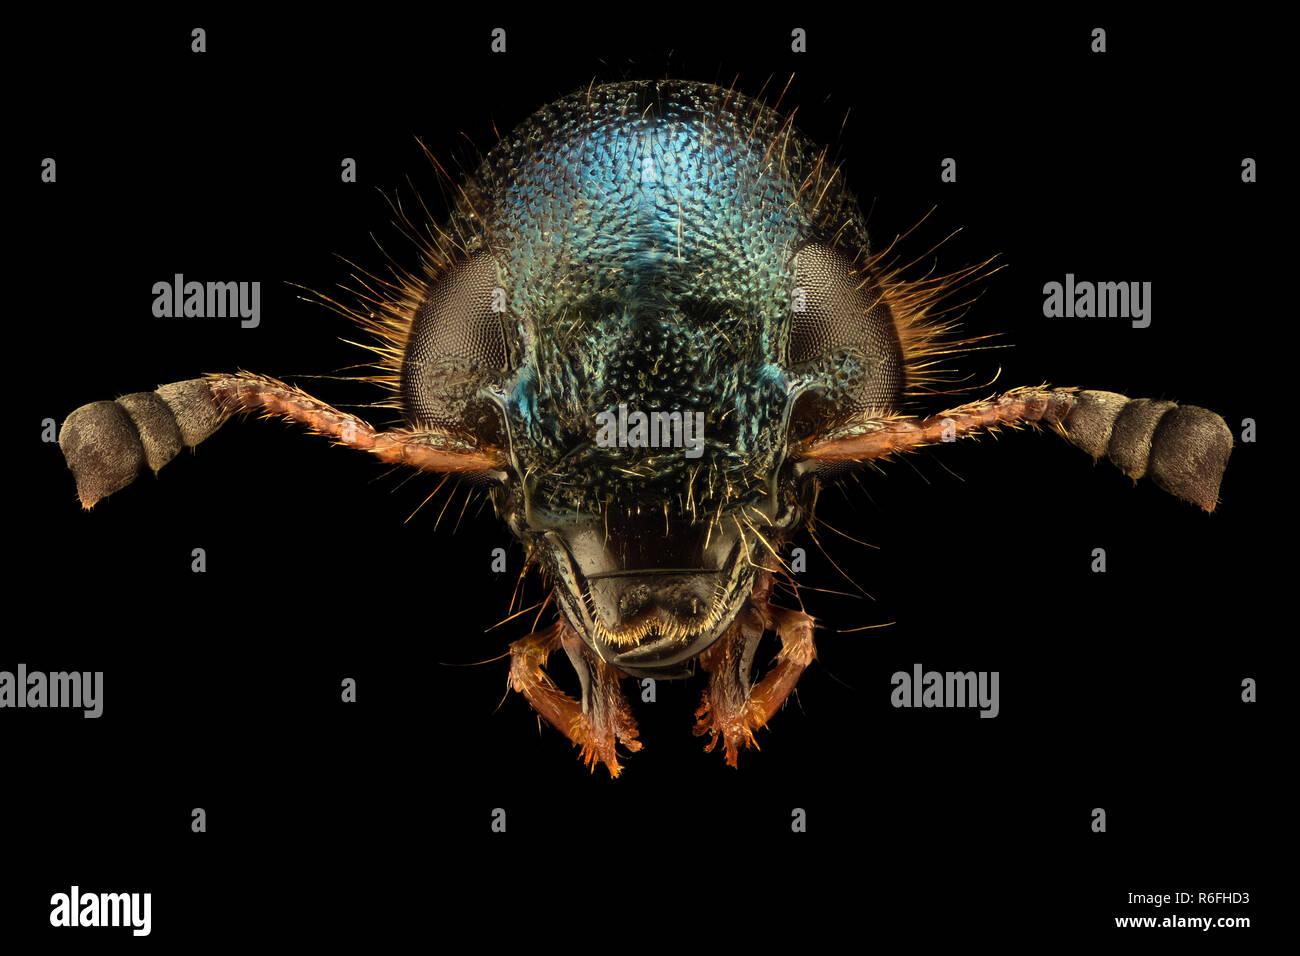 Extreme magnification - Jewel Beetle - Stock Image